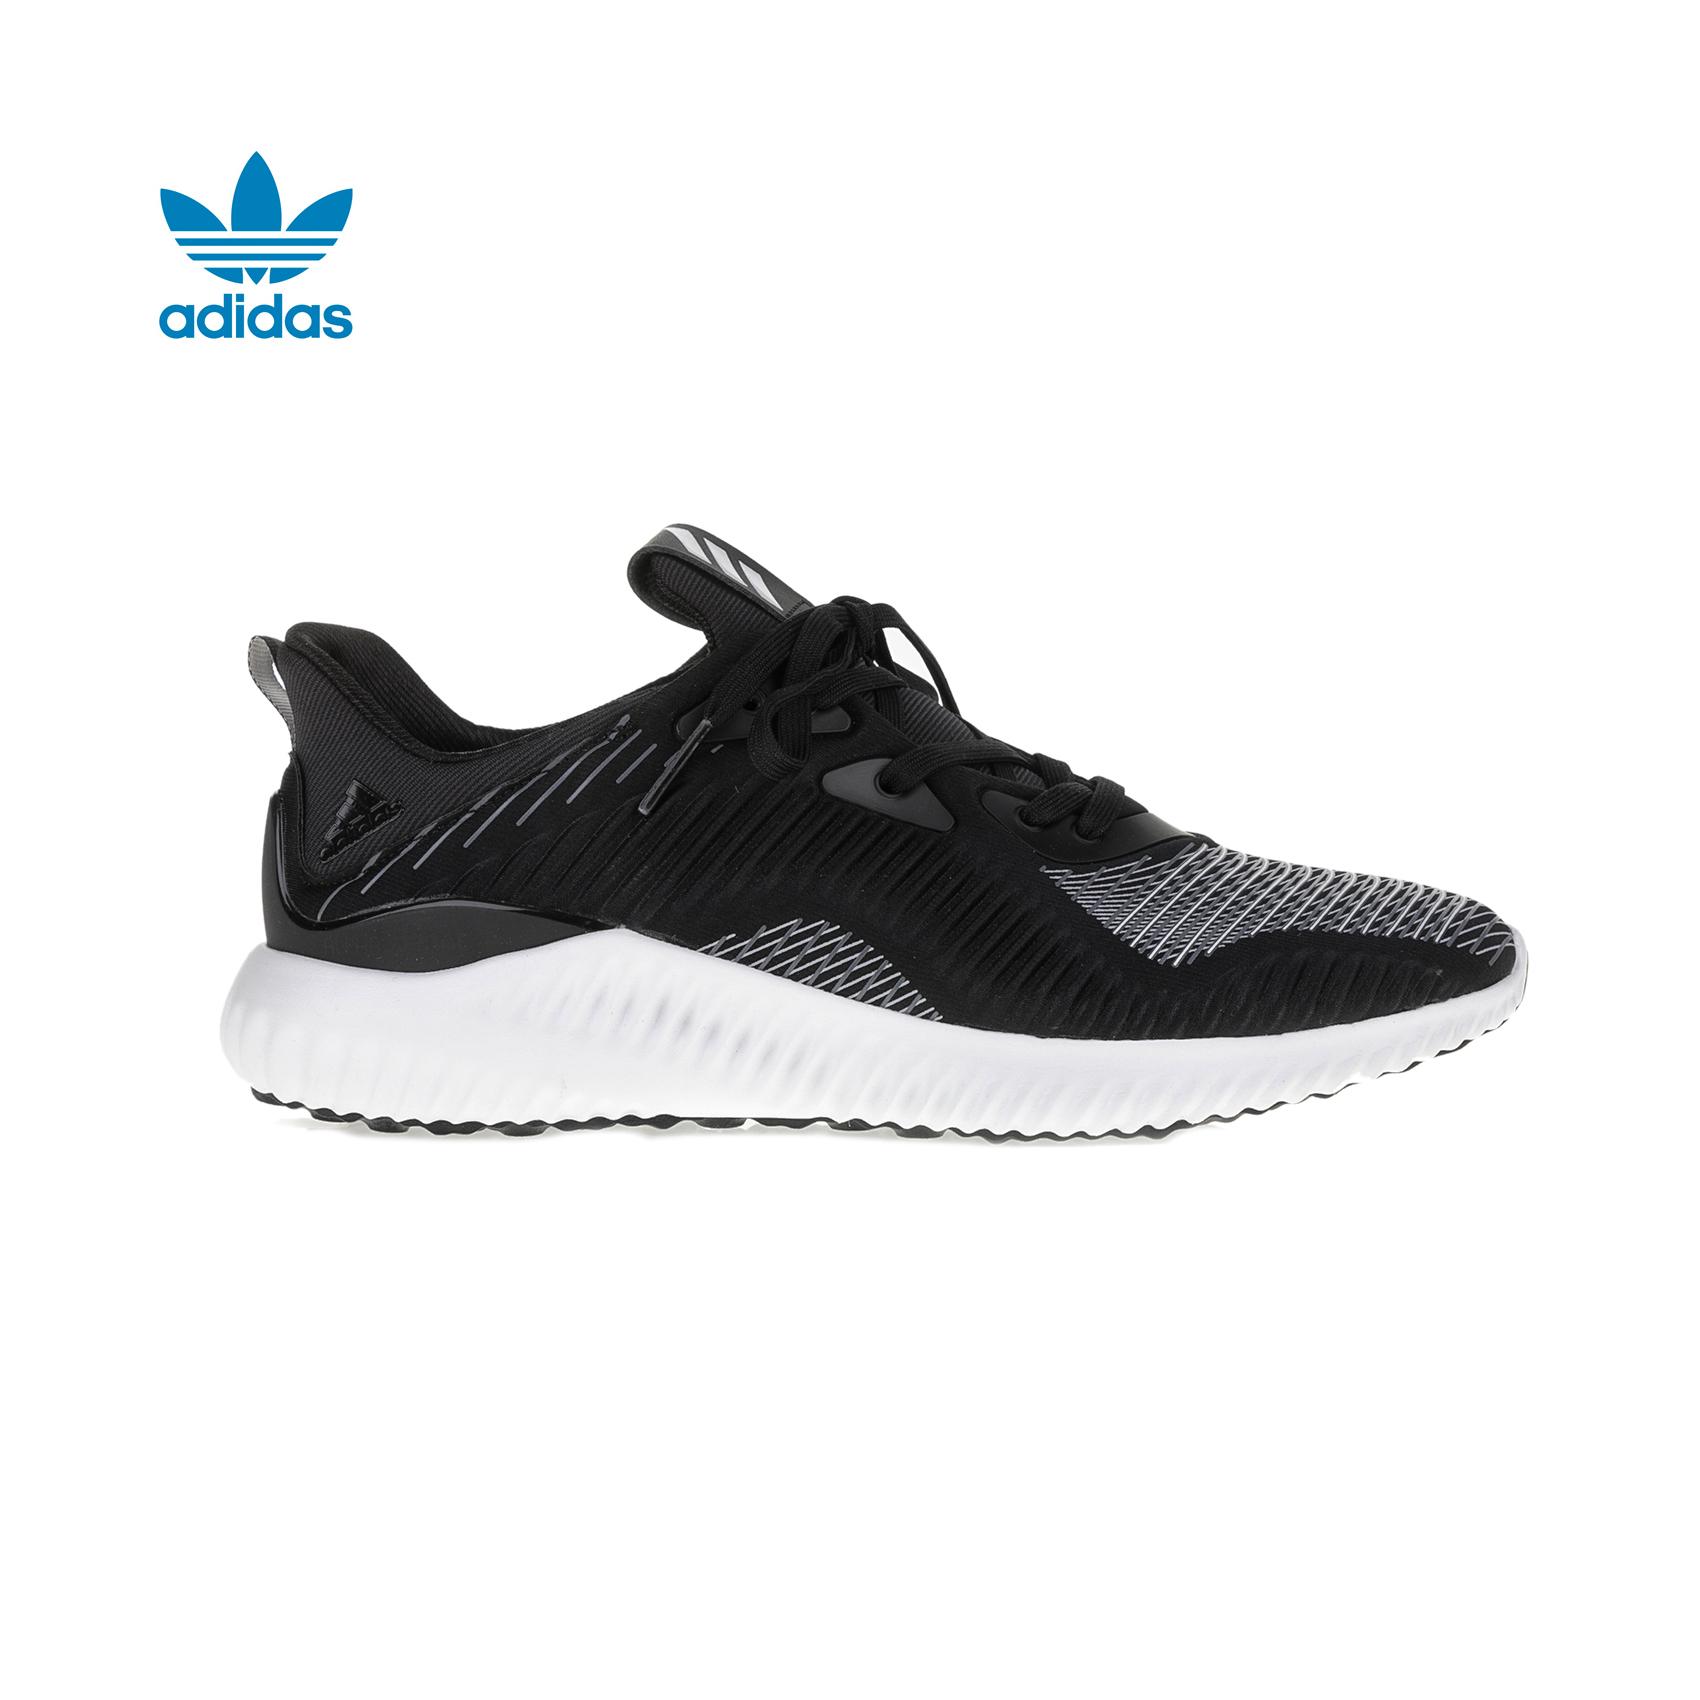 adidas Originals - Ανδρικά παπούτσια για τρέξιμο adidas alphabounce hpc μαύρα ανδρικά παπούτσια αθλητικά running